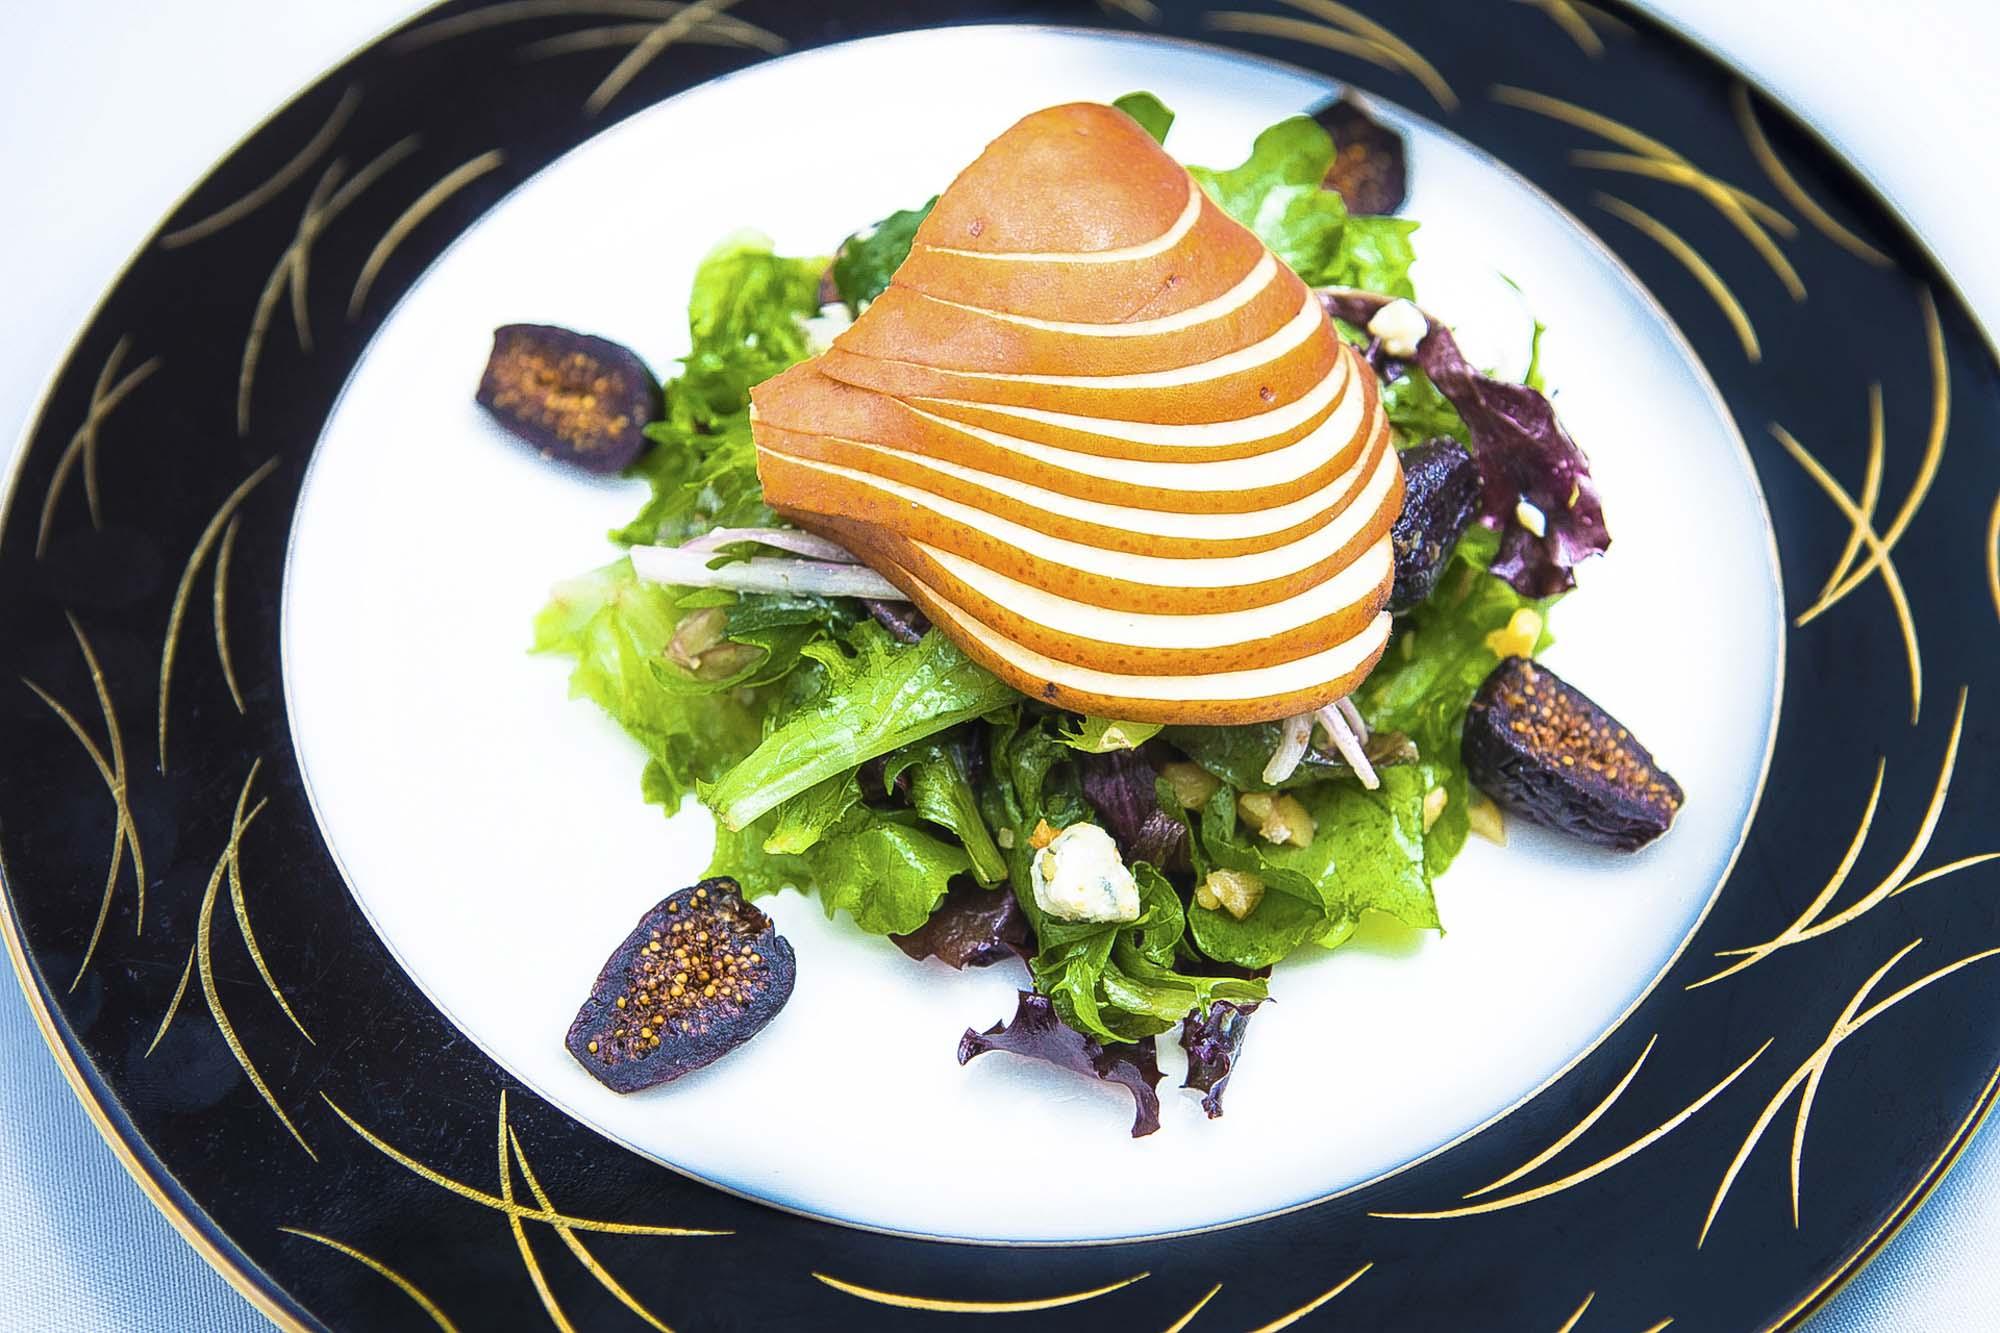 culinaryportfolio-3286.jpg